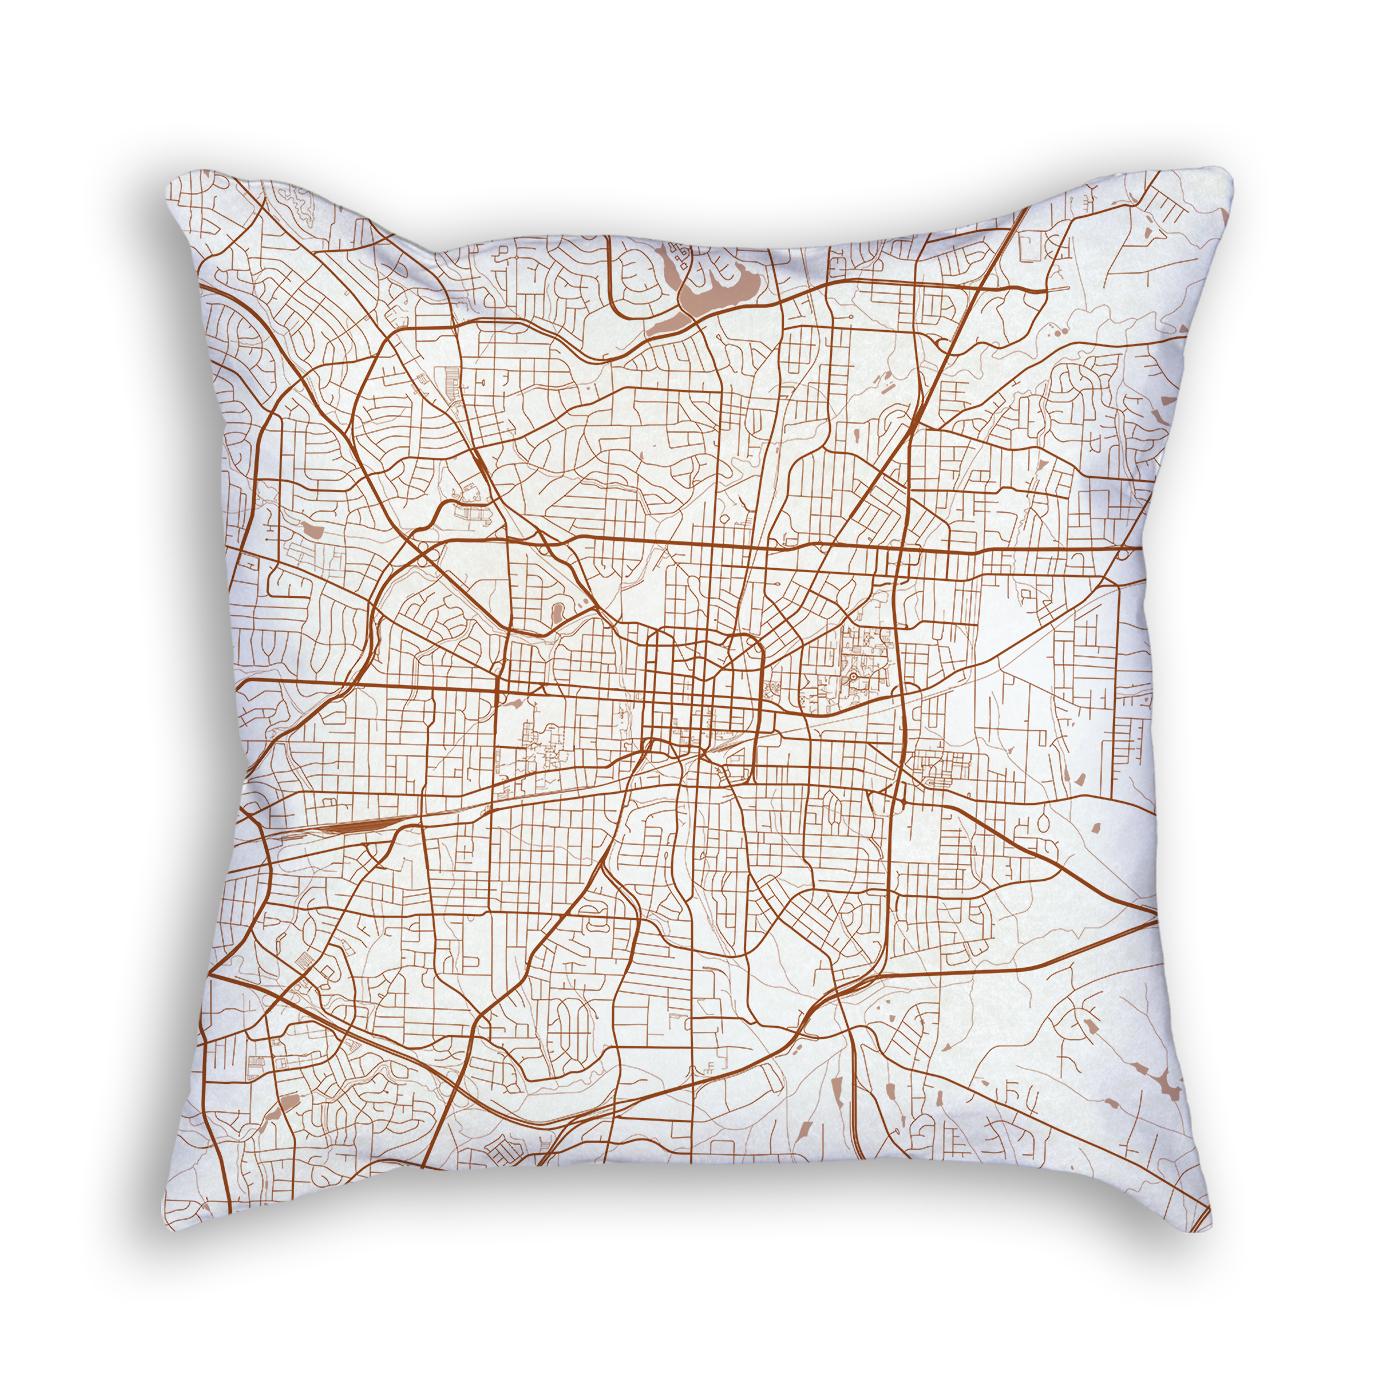 Greensboro NC City Map Art Decorative Throw Pillow